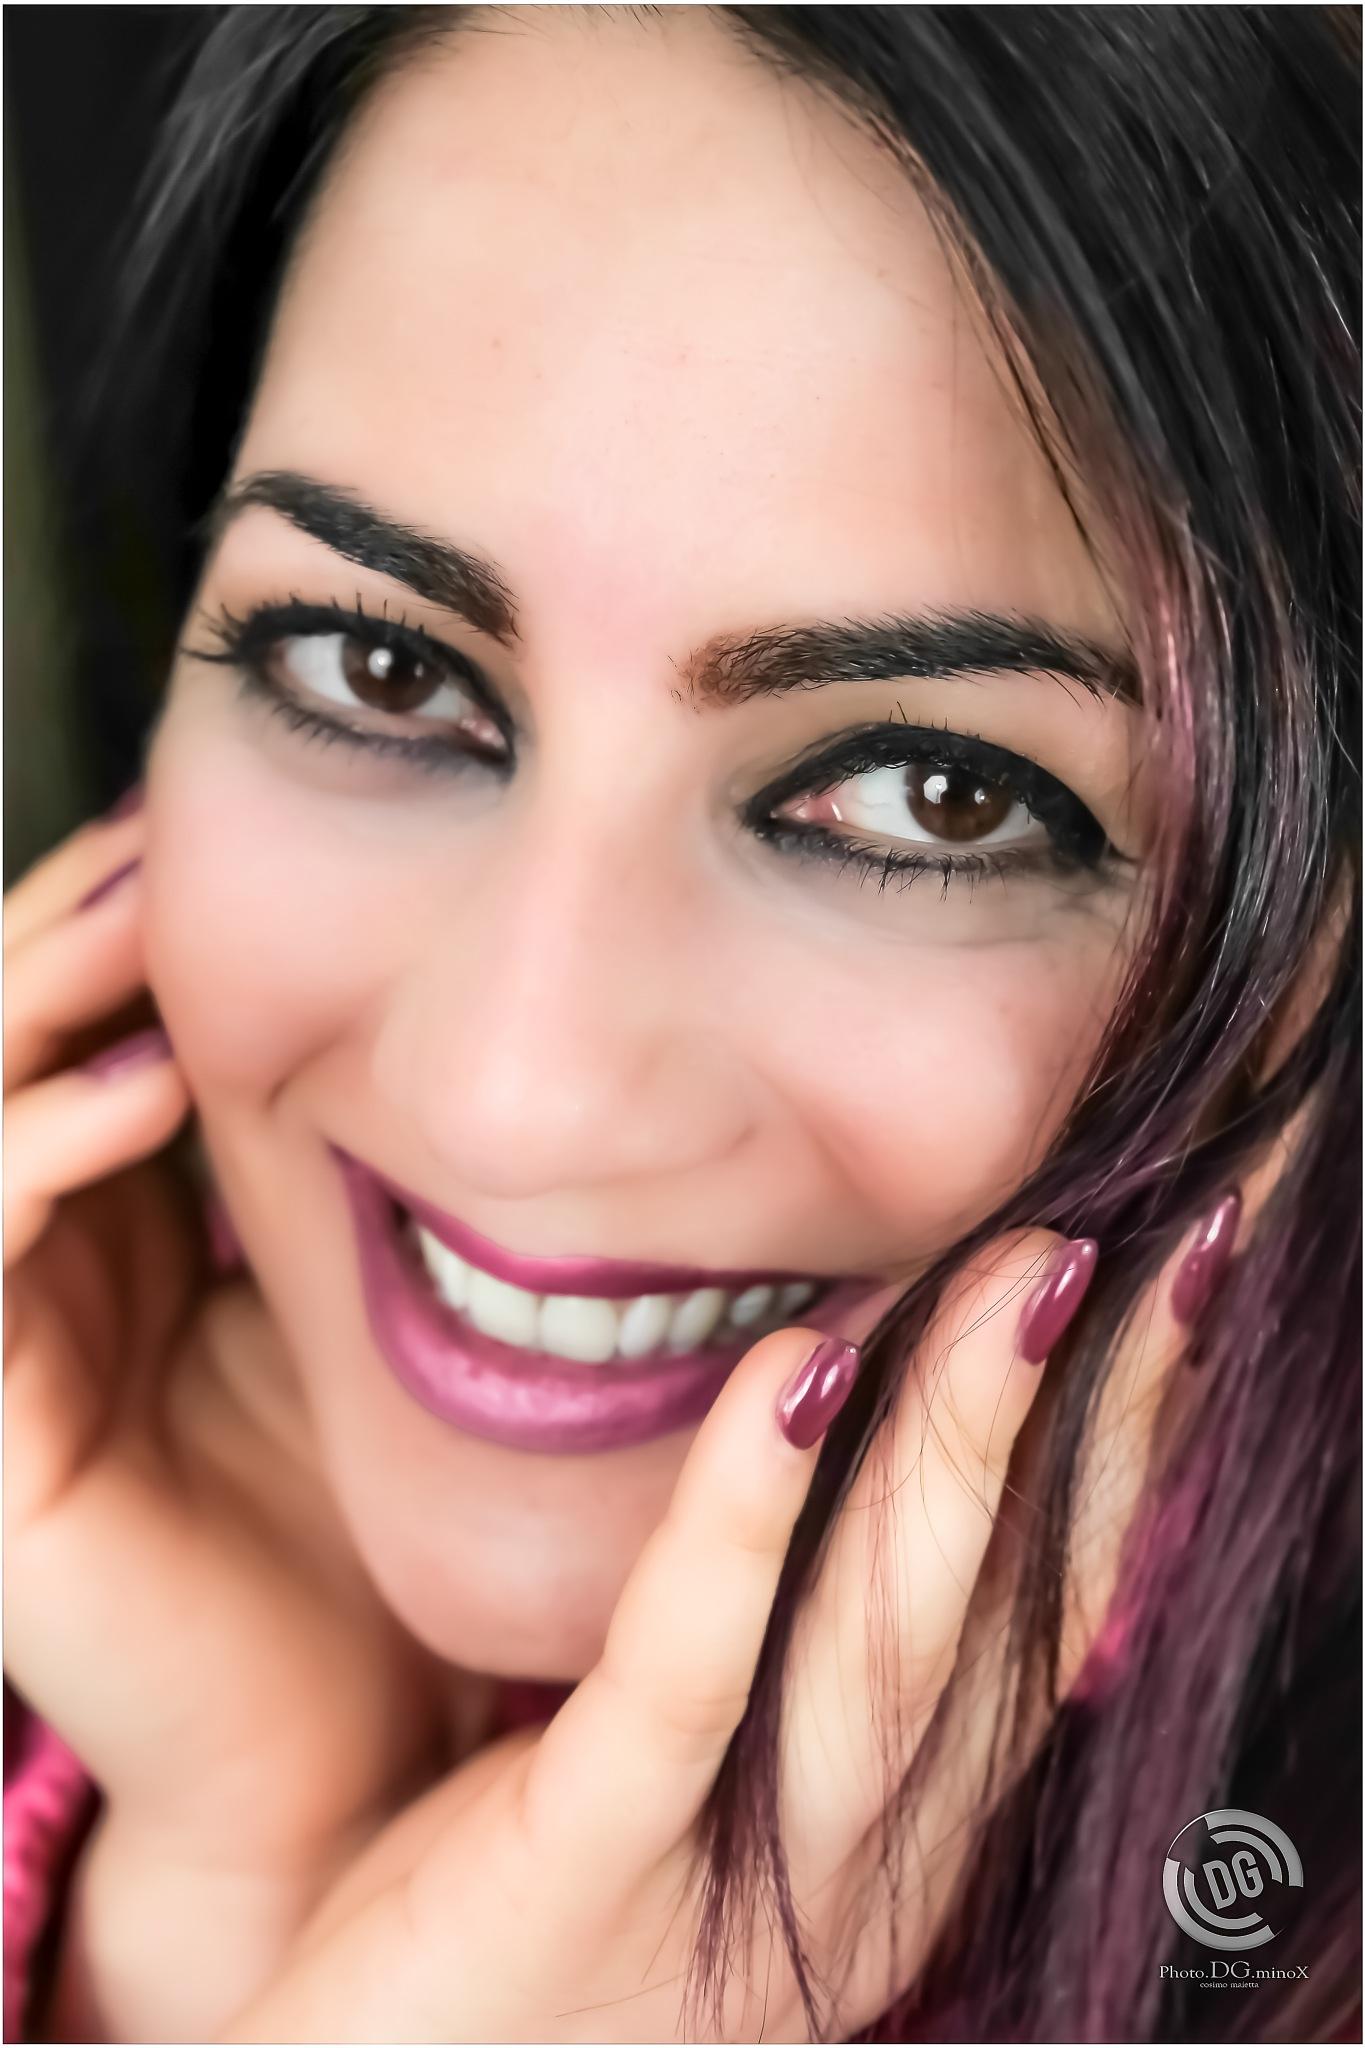 make-up by Ph.Dg.Mi. cosimo maietta